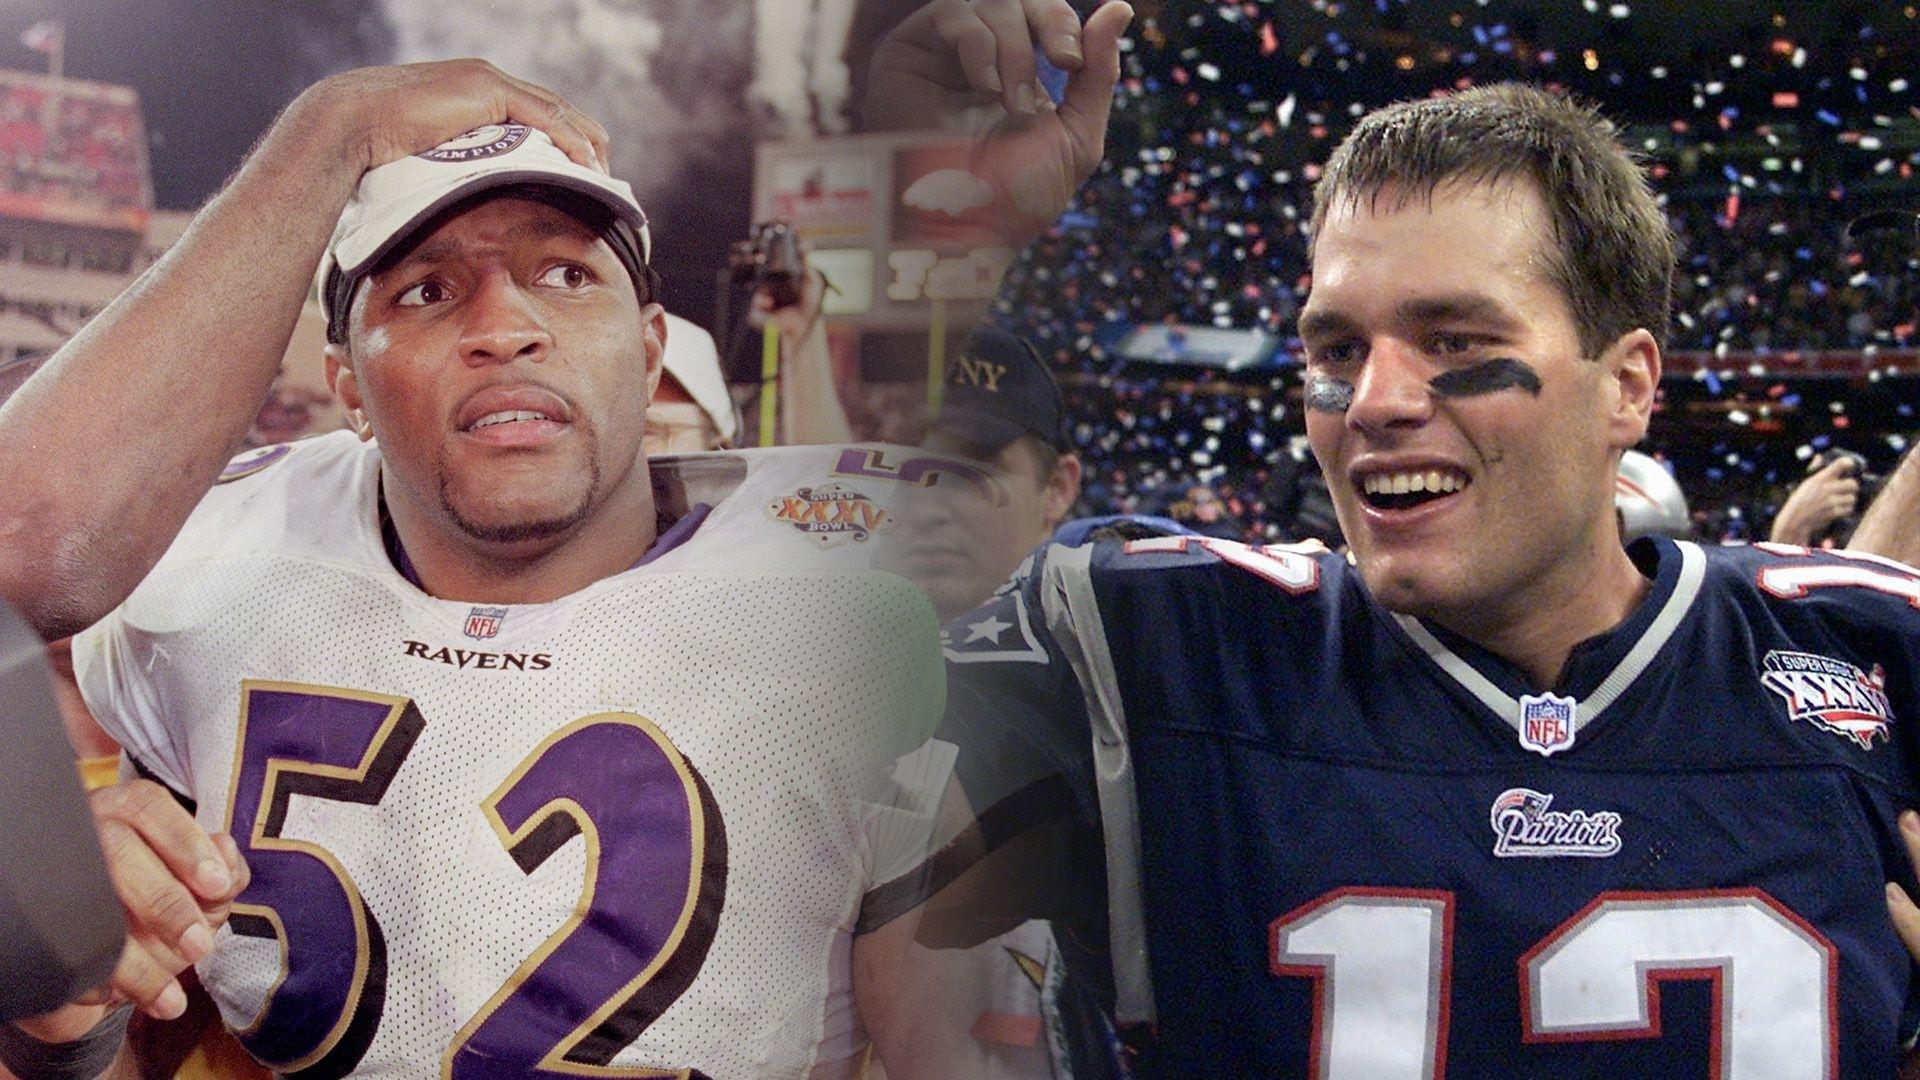 10 Worst Super Bowl Mvp Whiffs with regard to Super Bowl Mvp Voting